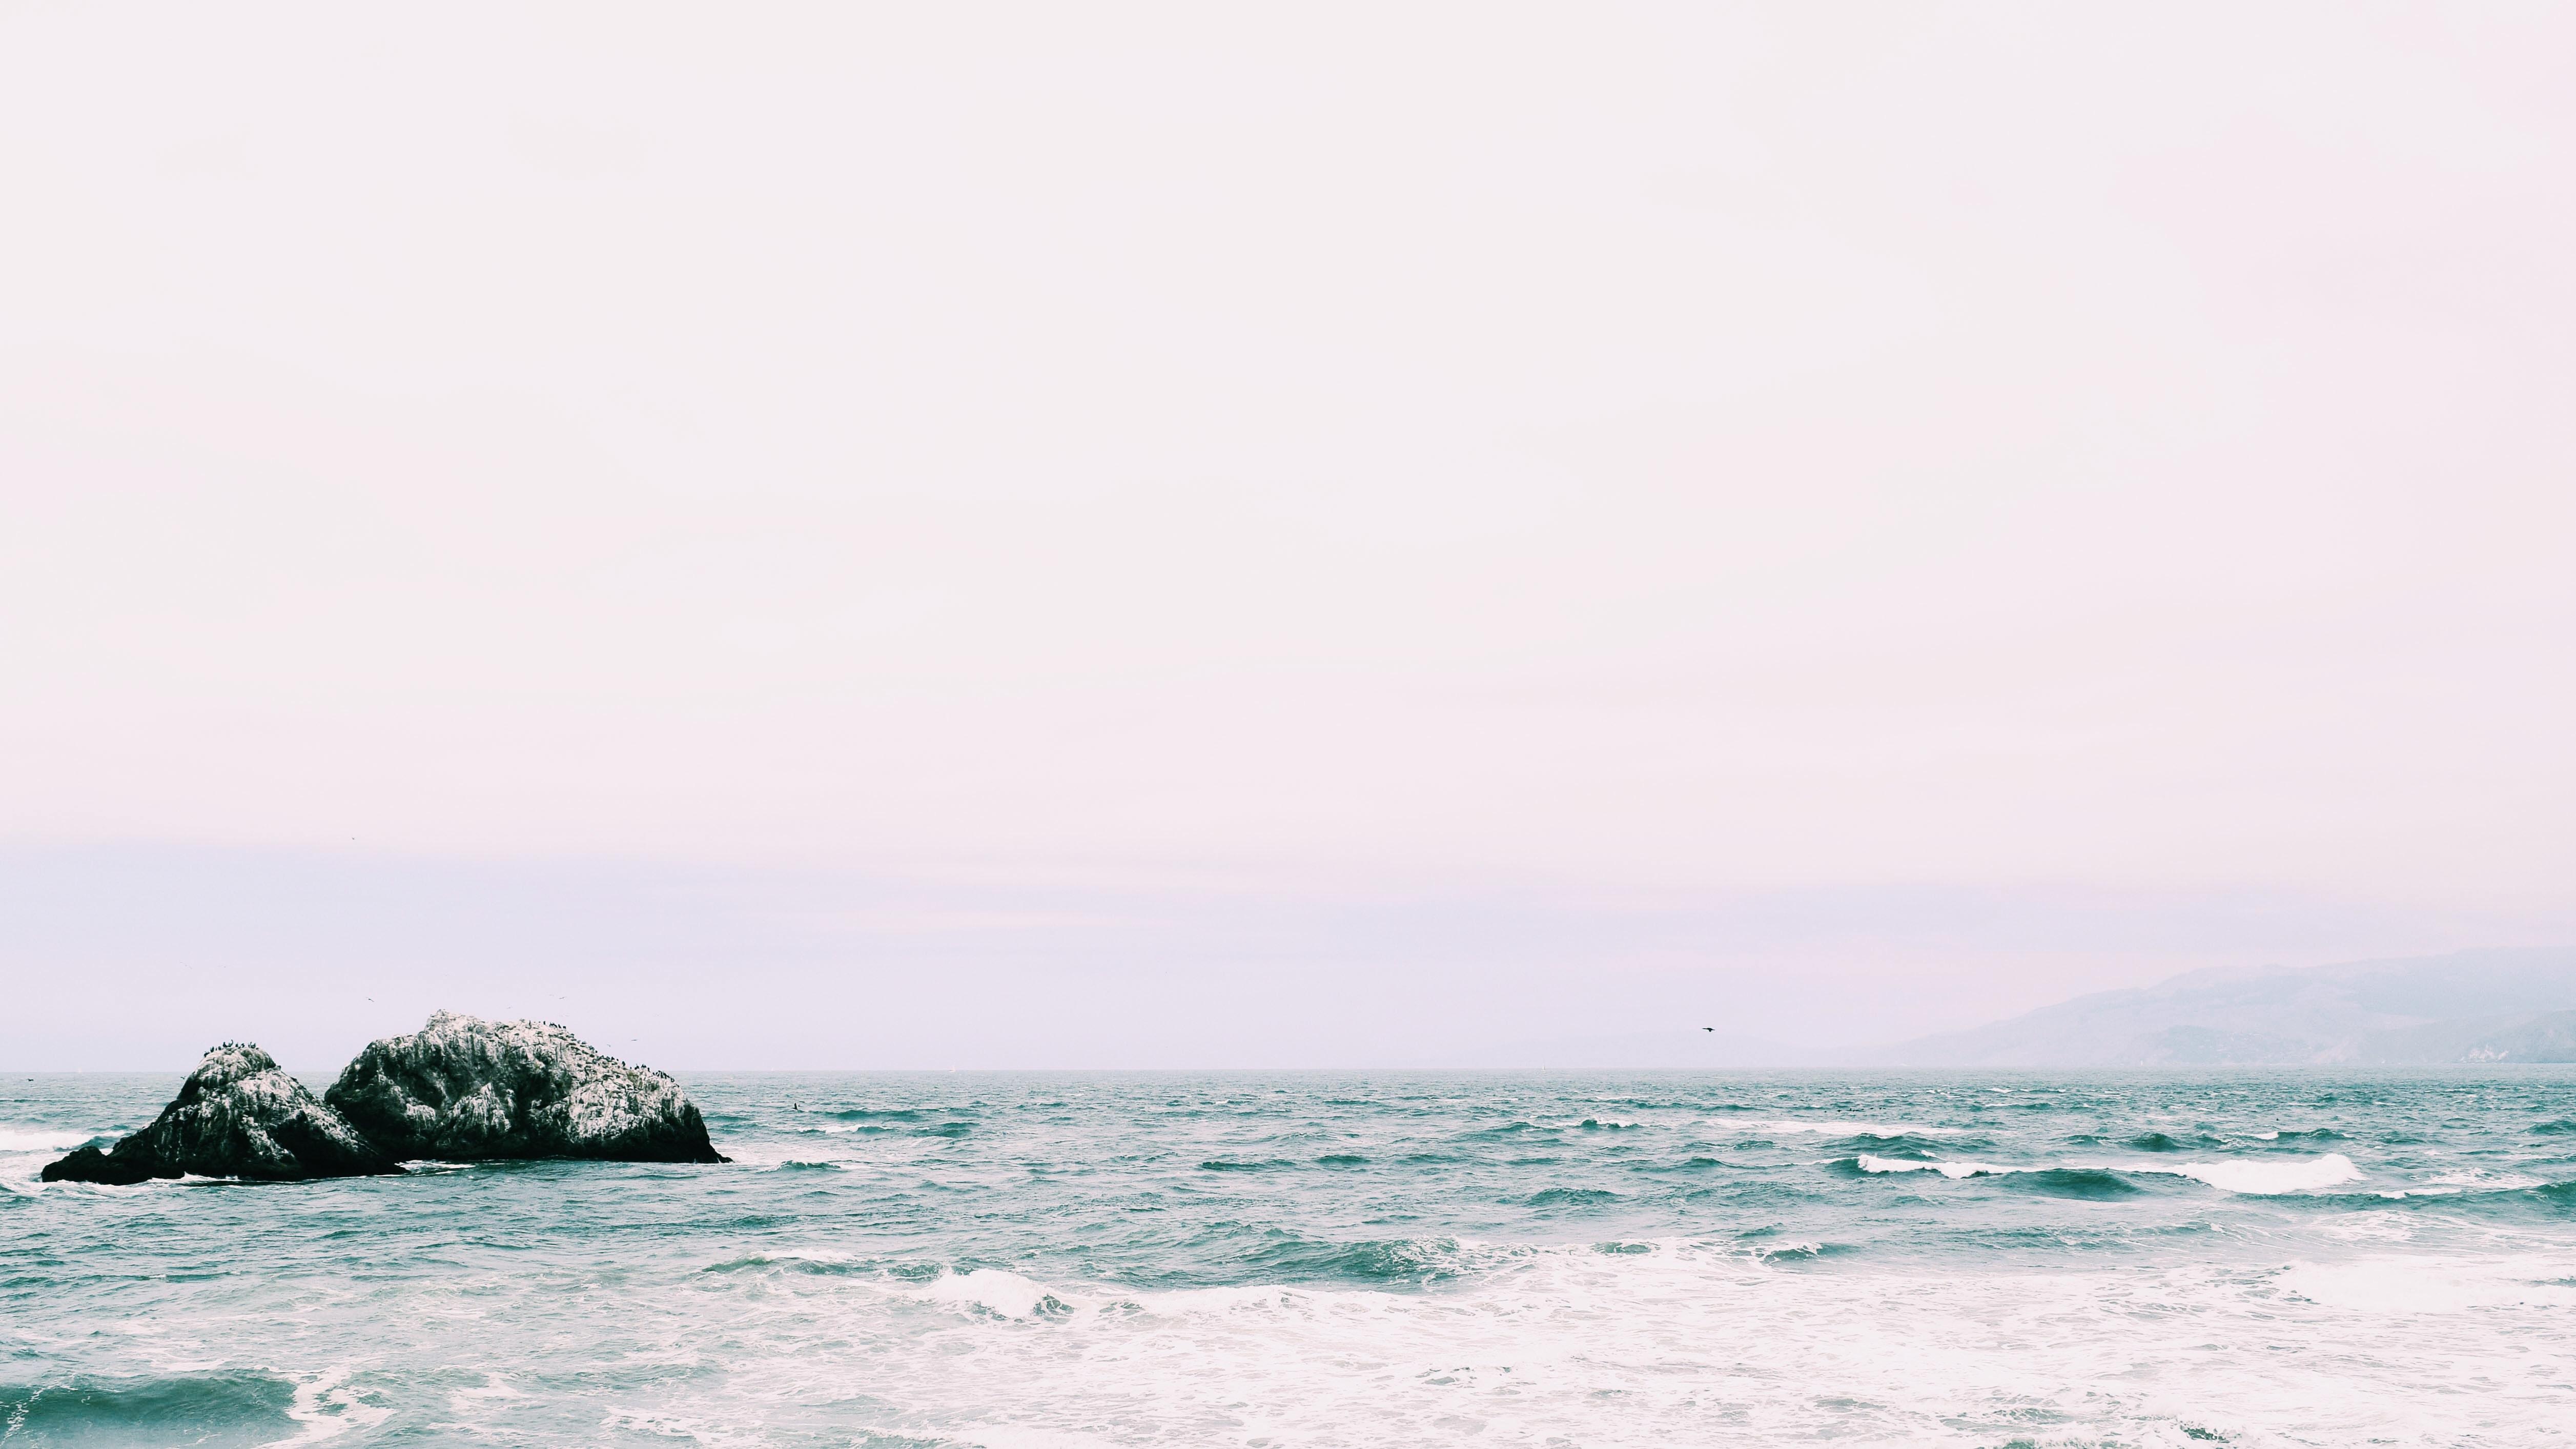 wavy sea under white sky